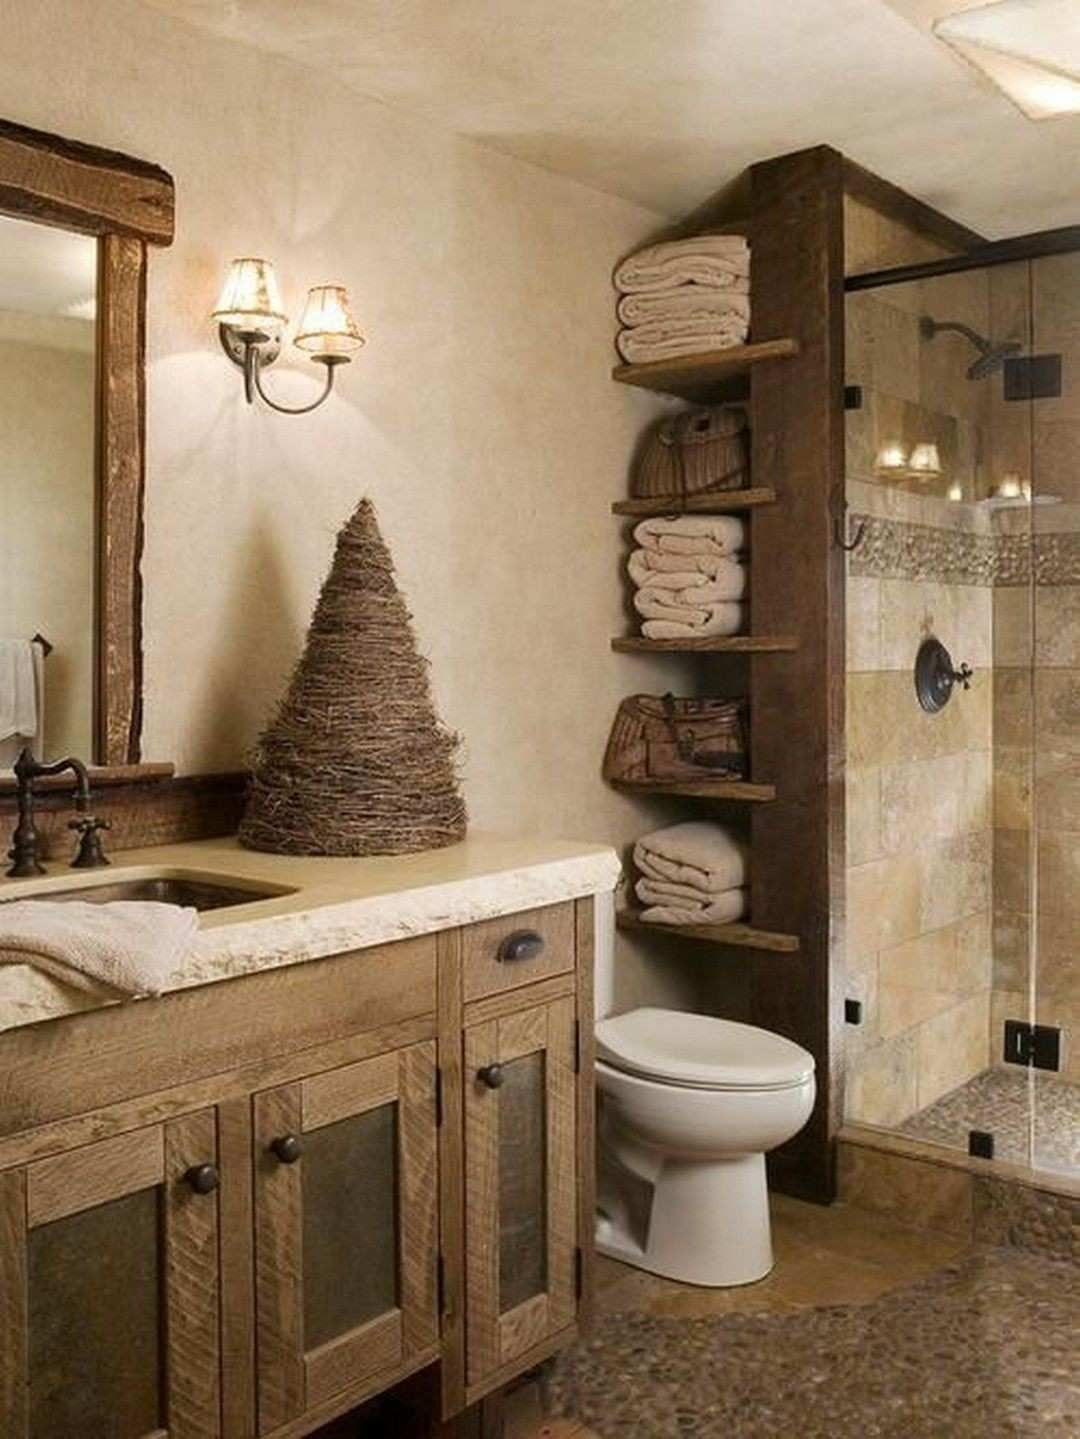 Etonnant Rustic Bathroom Lighting Ideas #RusticBathroomDecoratingIdeas Rustic  Farmhouse Bathroom Decor Ideas Do You Think He Or She Will Like It?